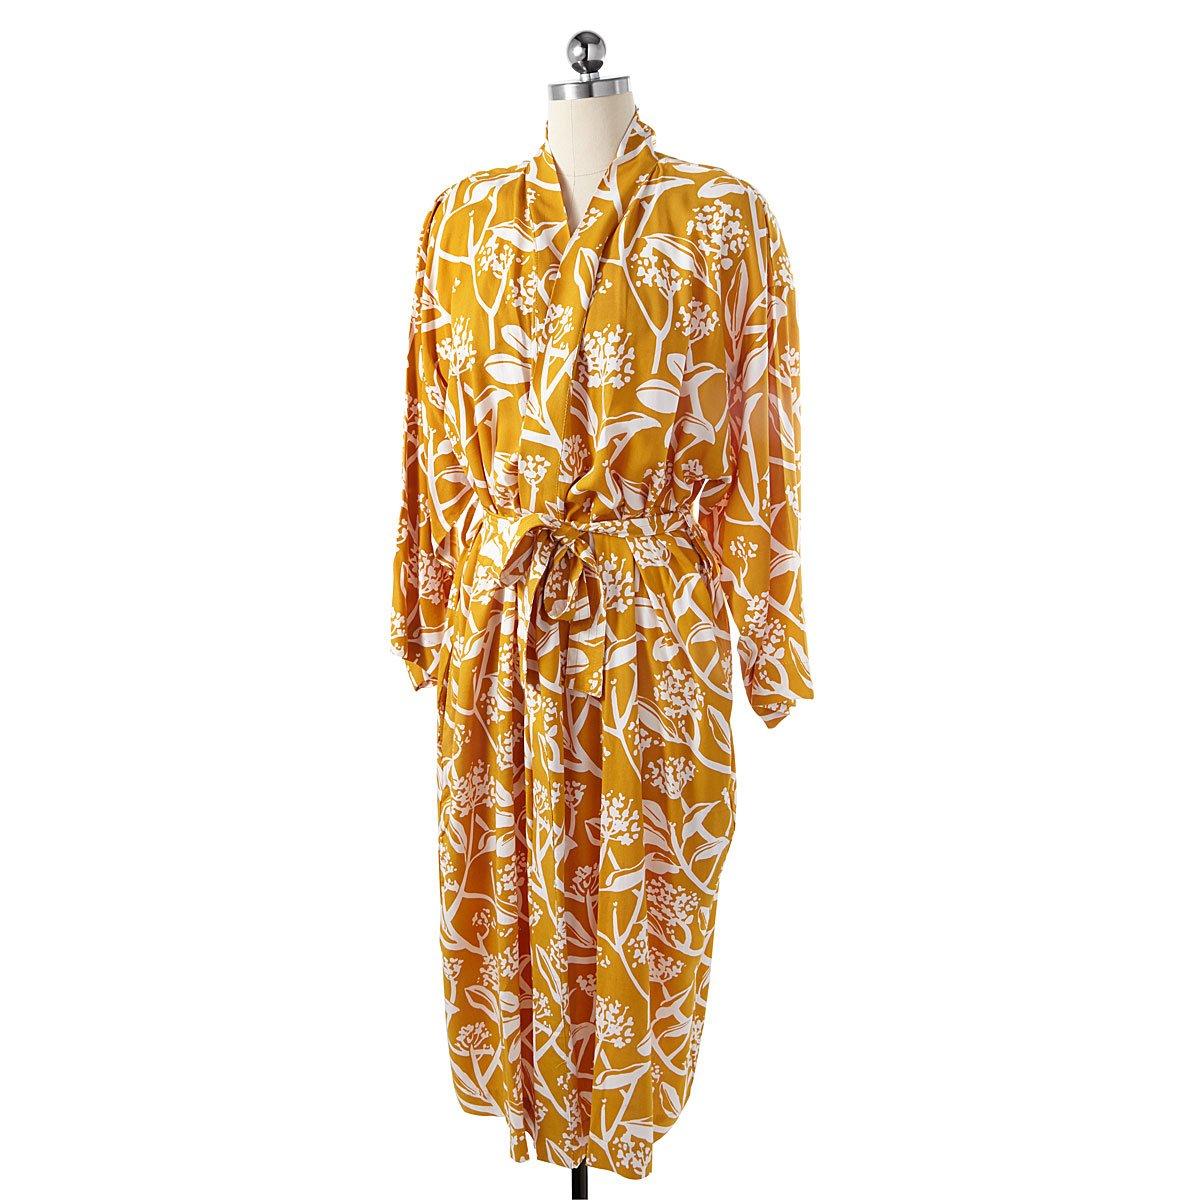 Golden Floral Kimono Robe | UncommonGoods